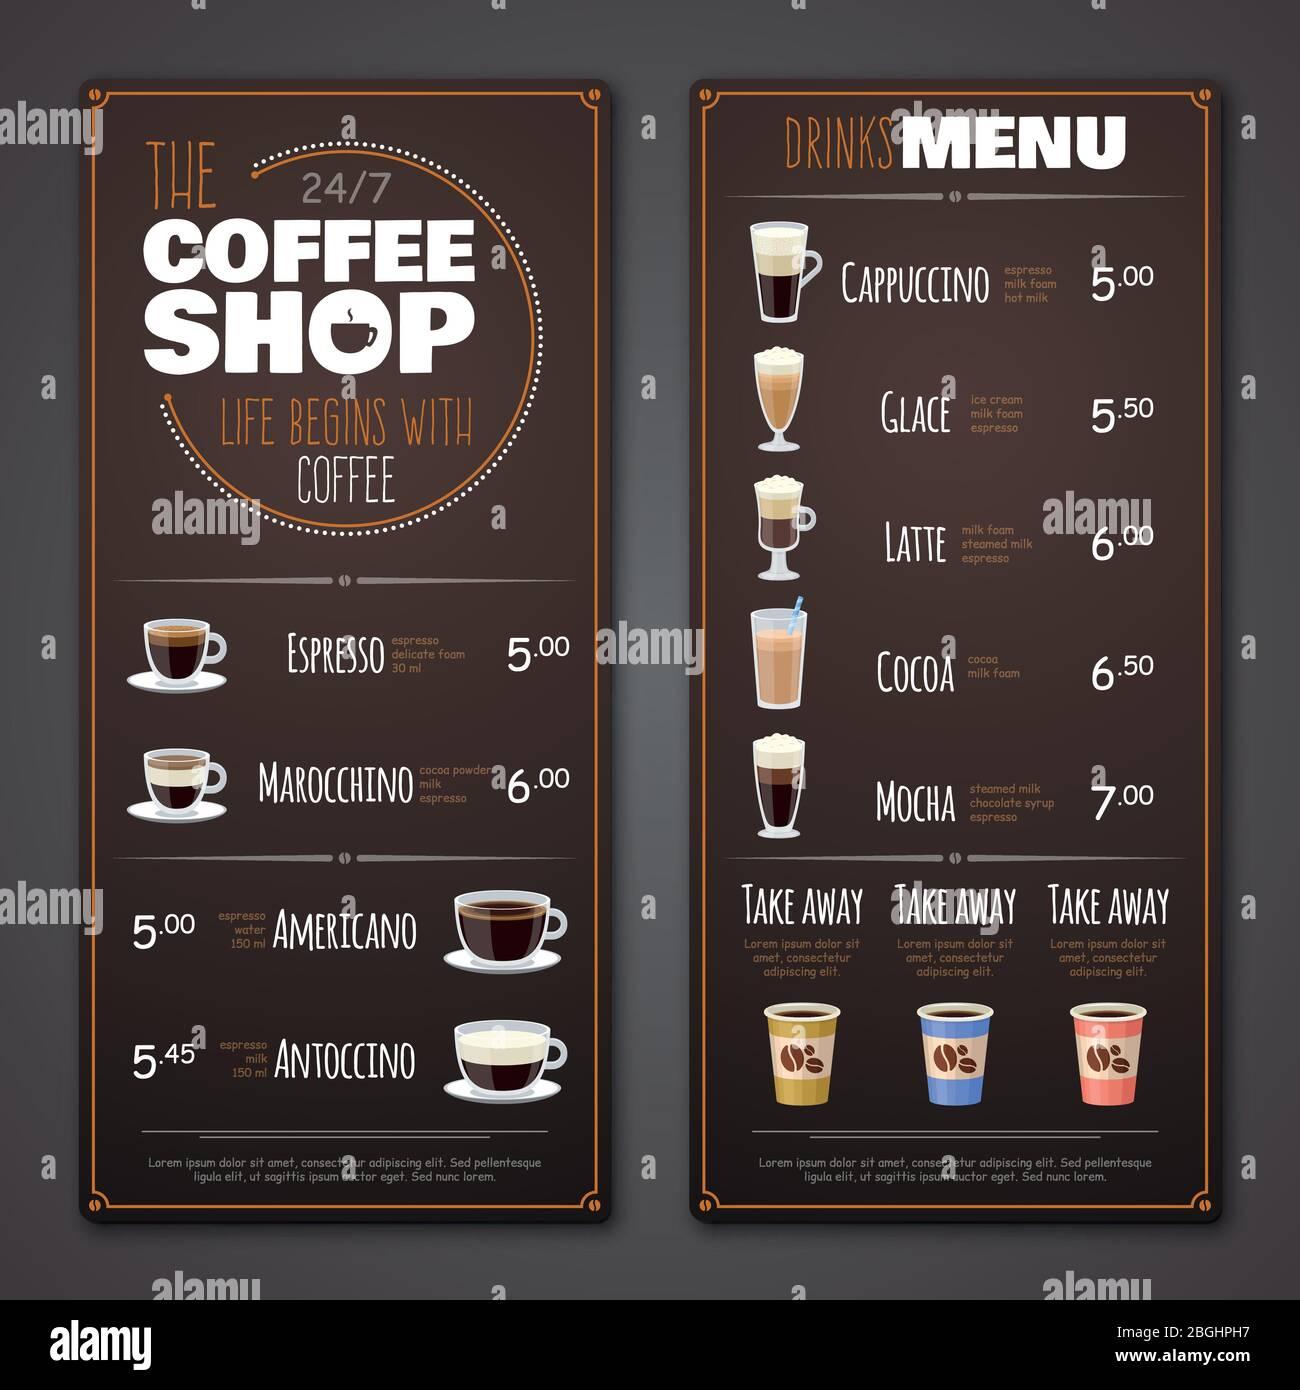 Coffee Shop Menu Vector Design Template Cafe Shop Banner With Drink Illustration Stock Vector Image Art Alamy